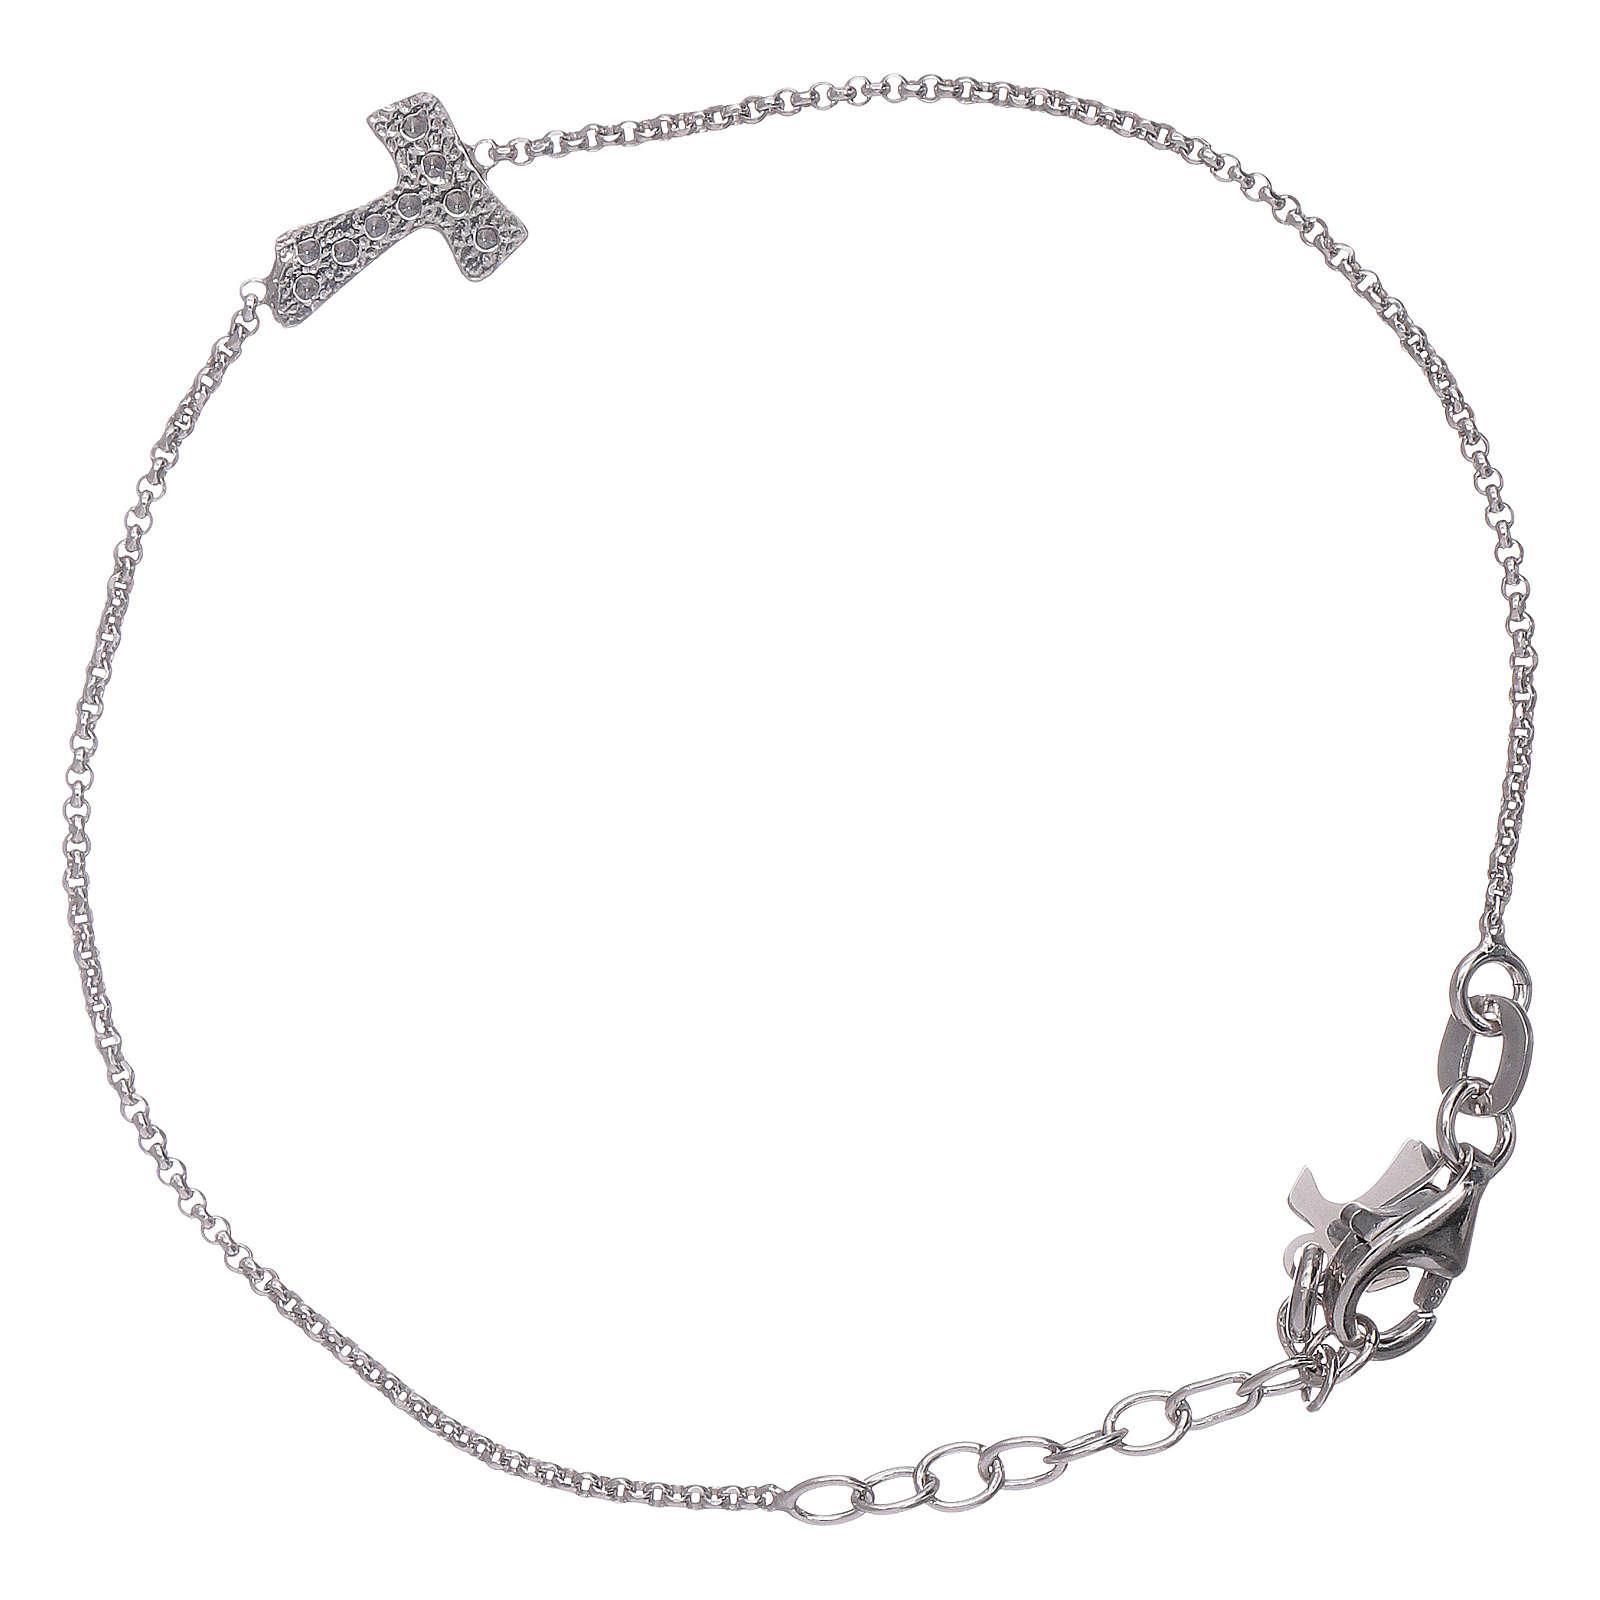 Bracciale AMEN croce zirconata Tau arg 925 4